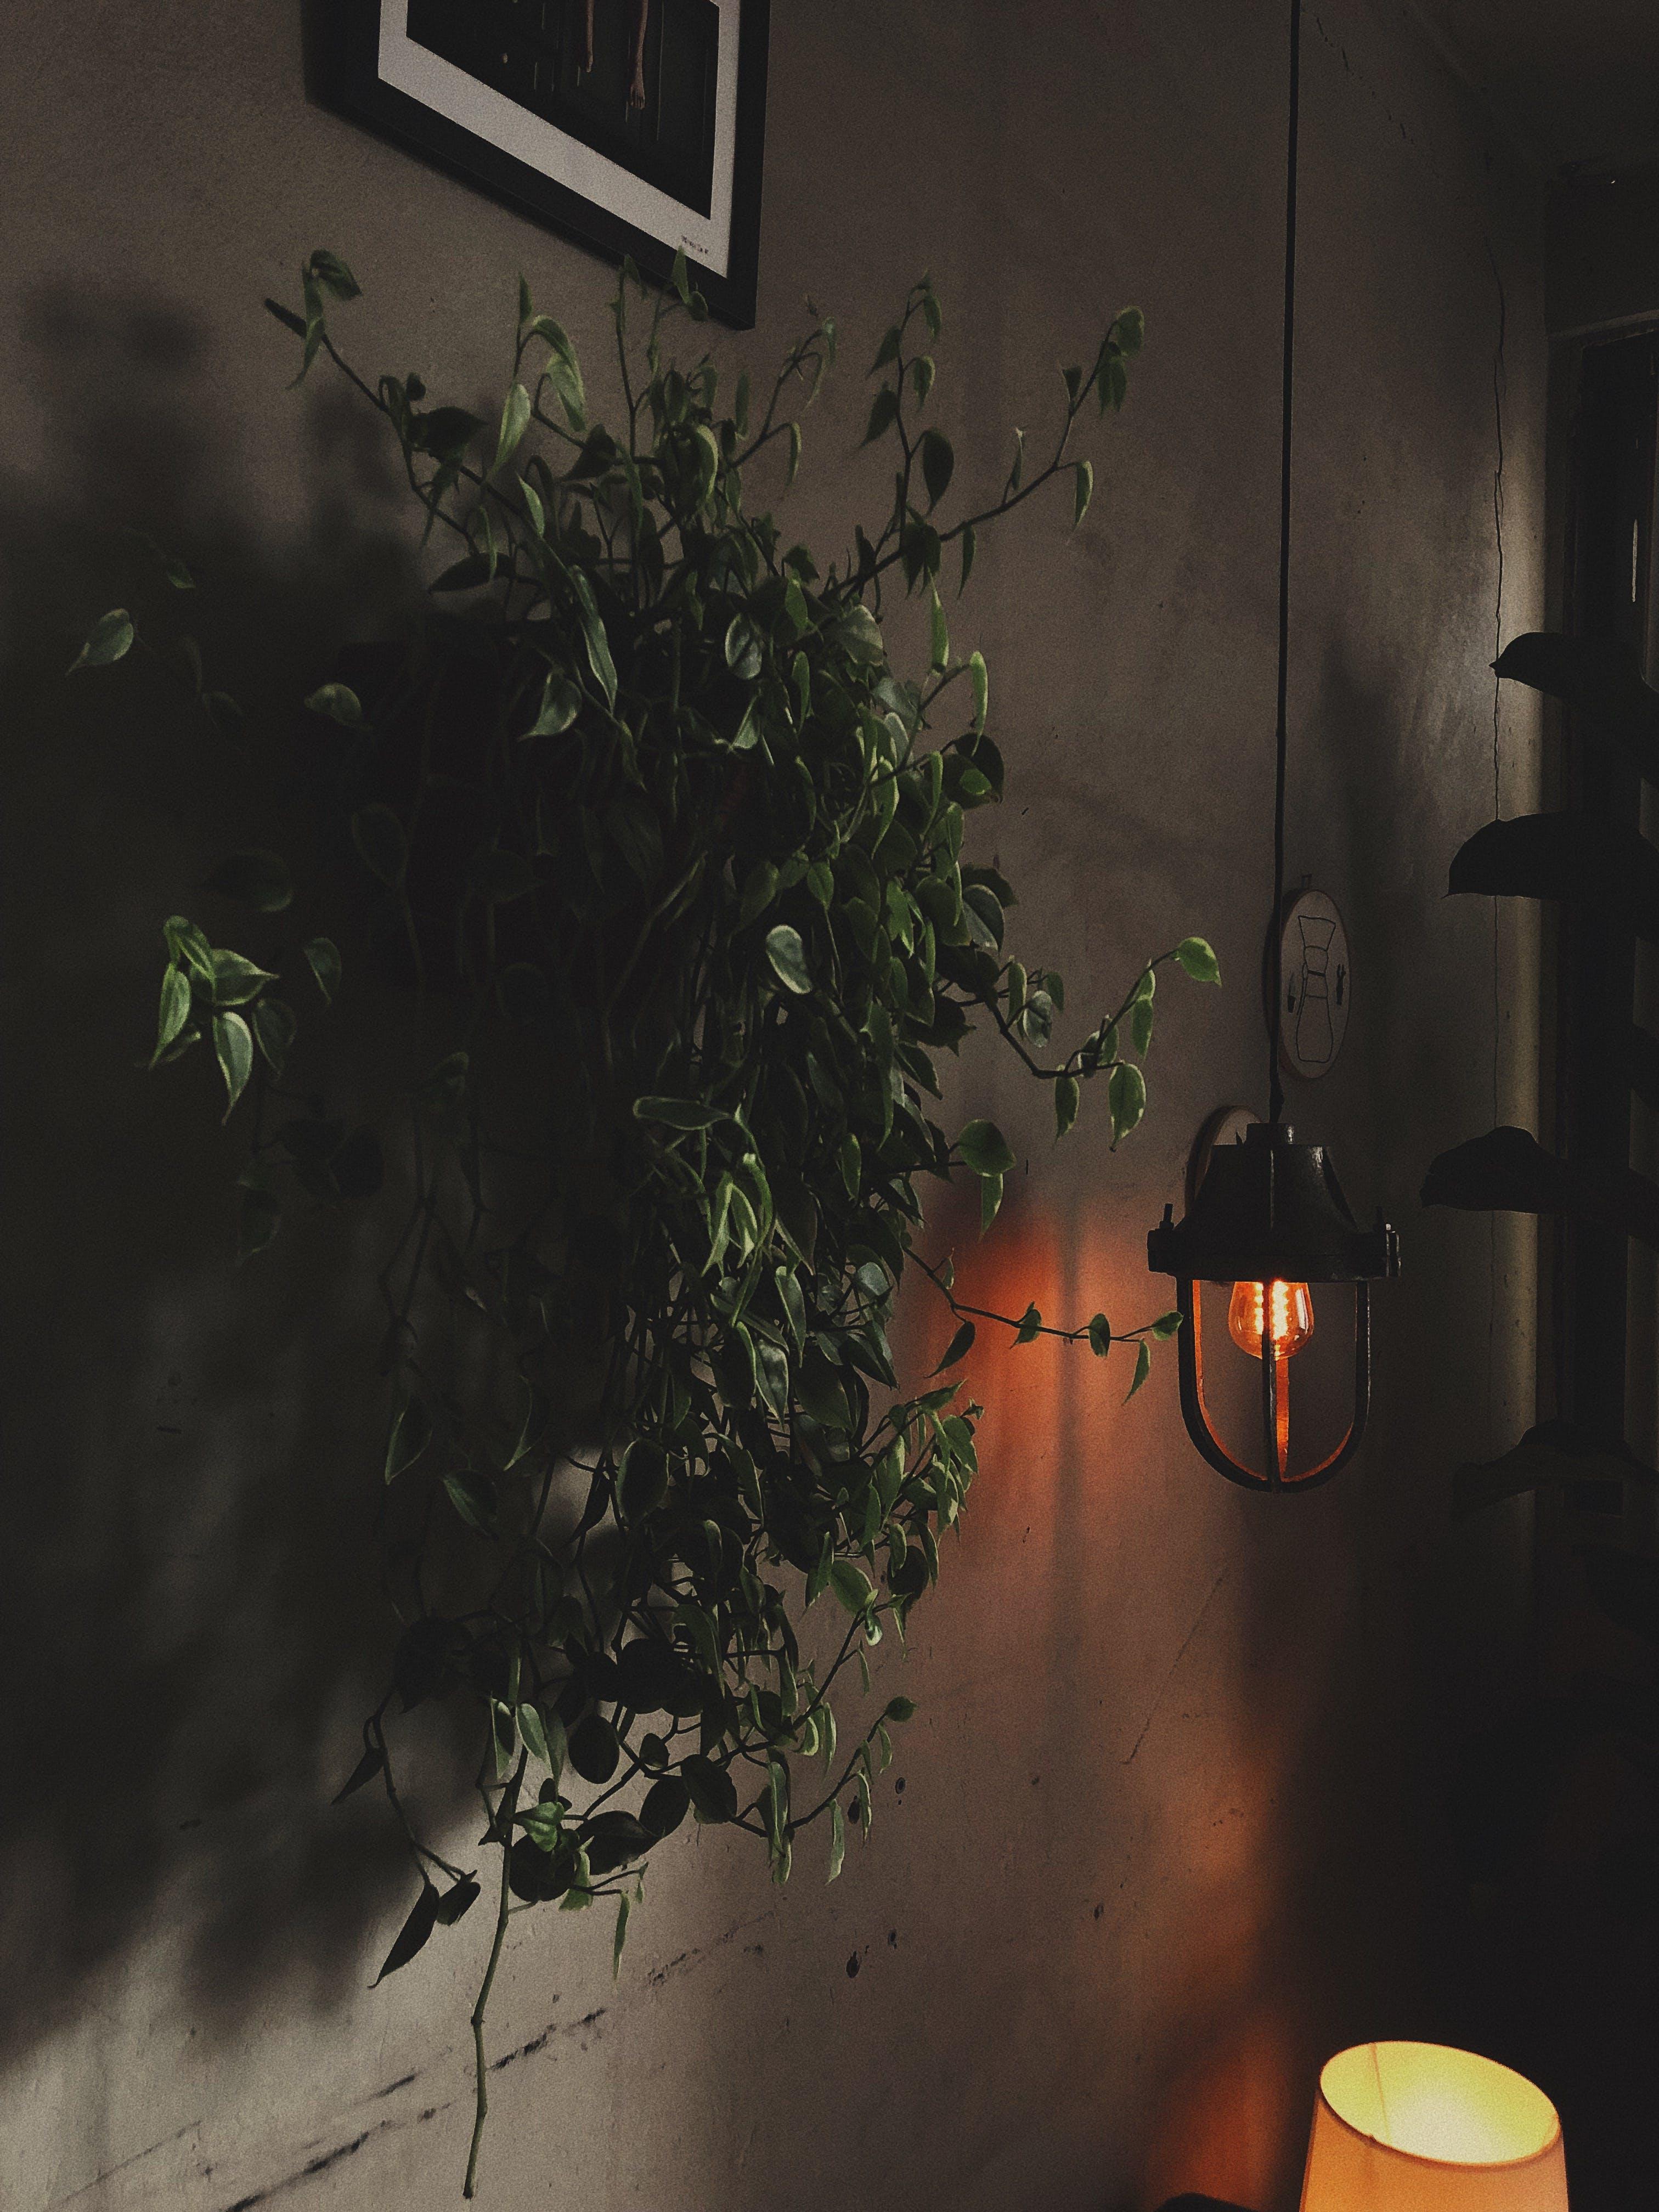 Green-leafed Plants Beside Pendant Lamp